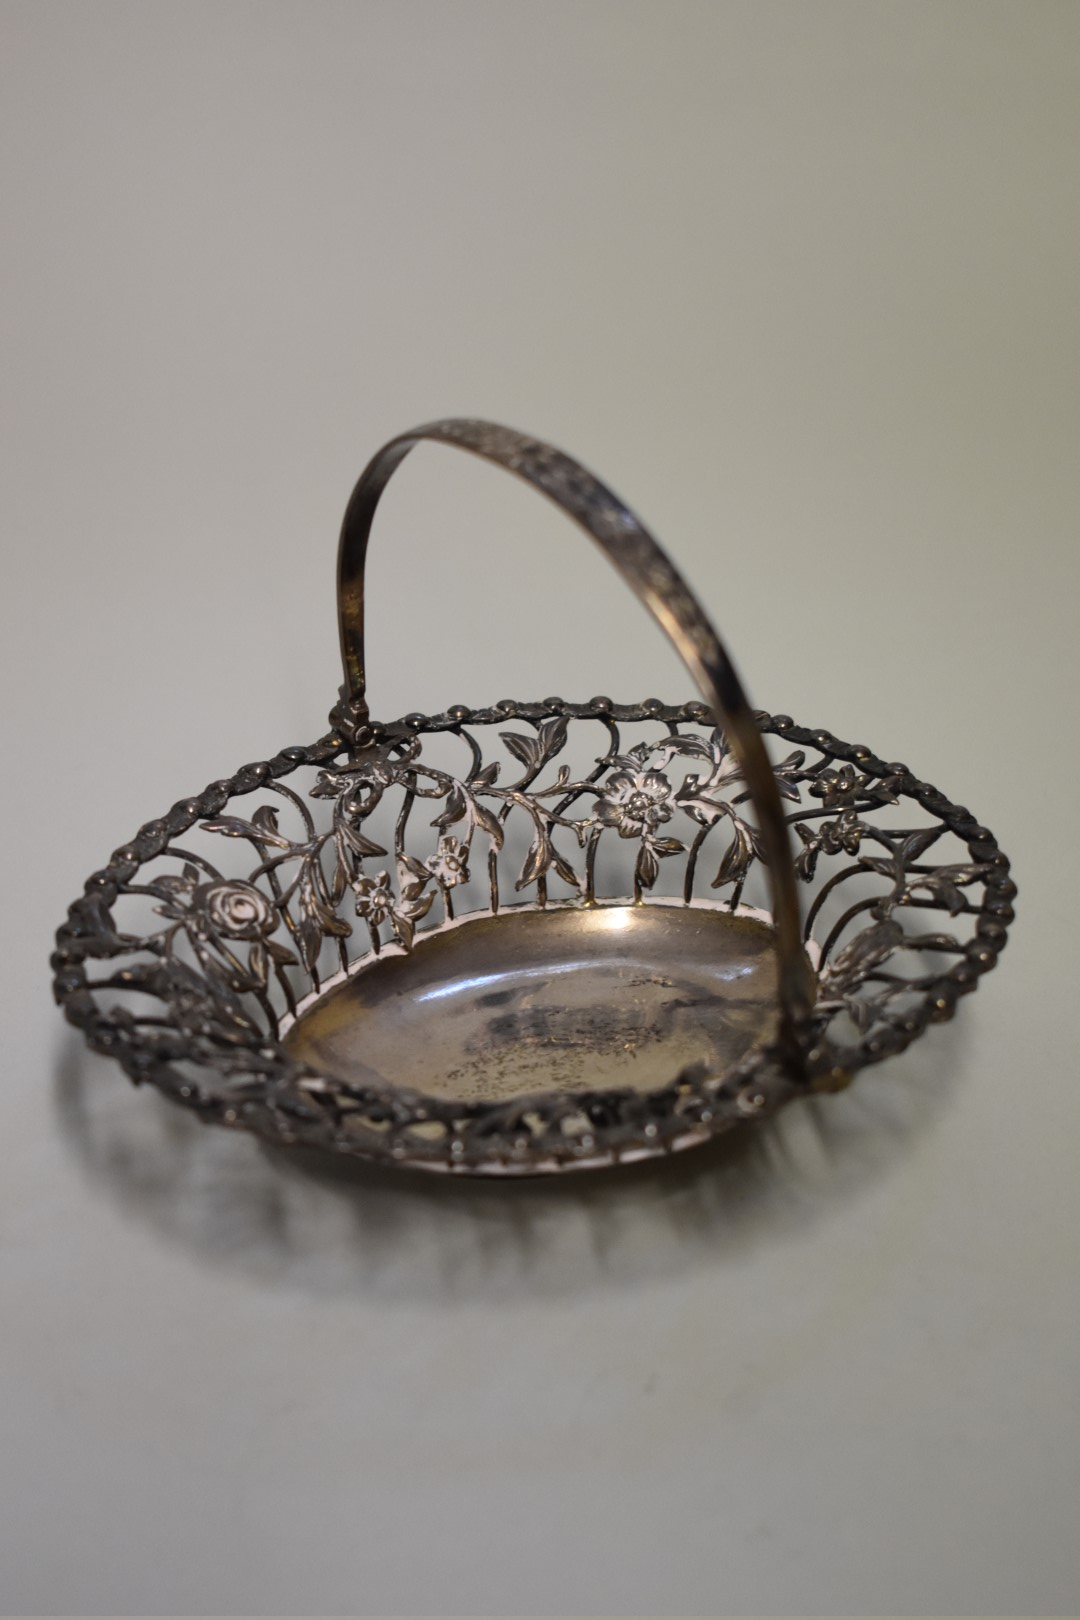 Lot 11 - A George III silver swing handled bonbon basket, makers mark indistinct,London 1762, 16cm, 166g.